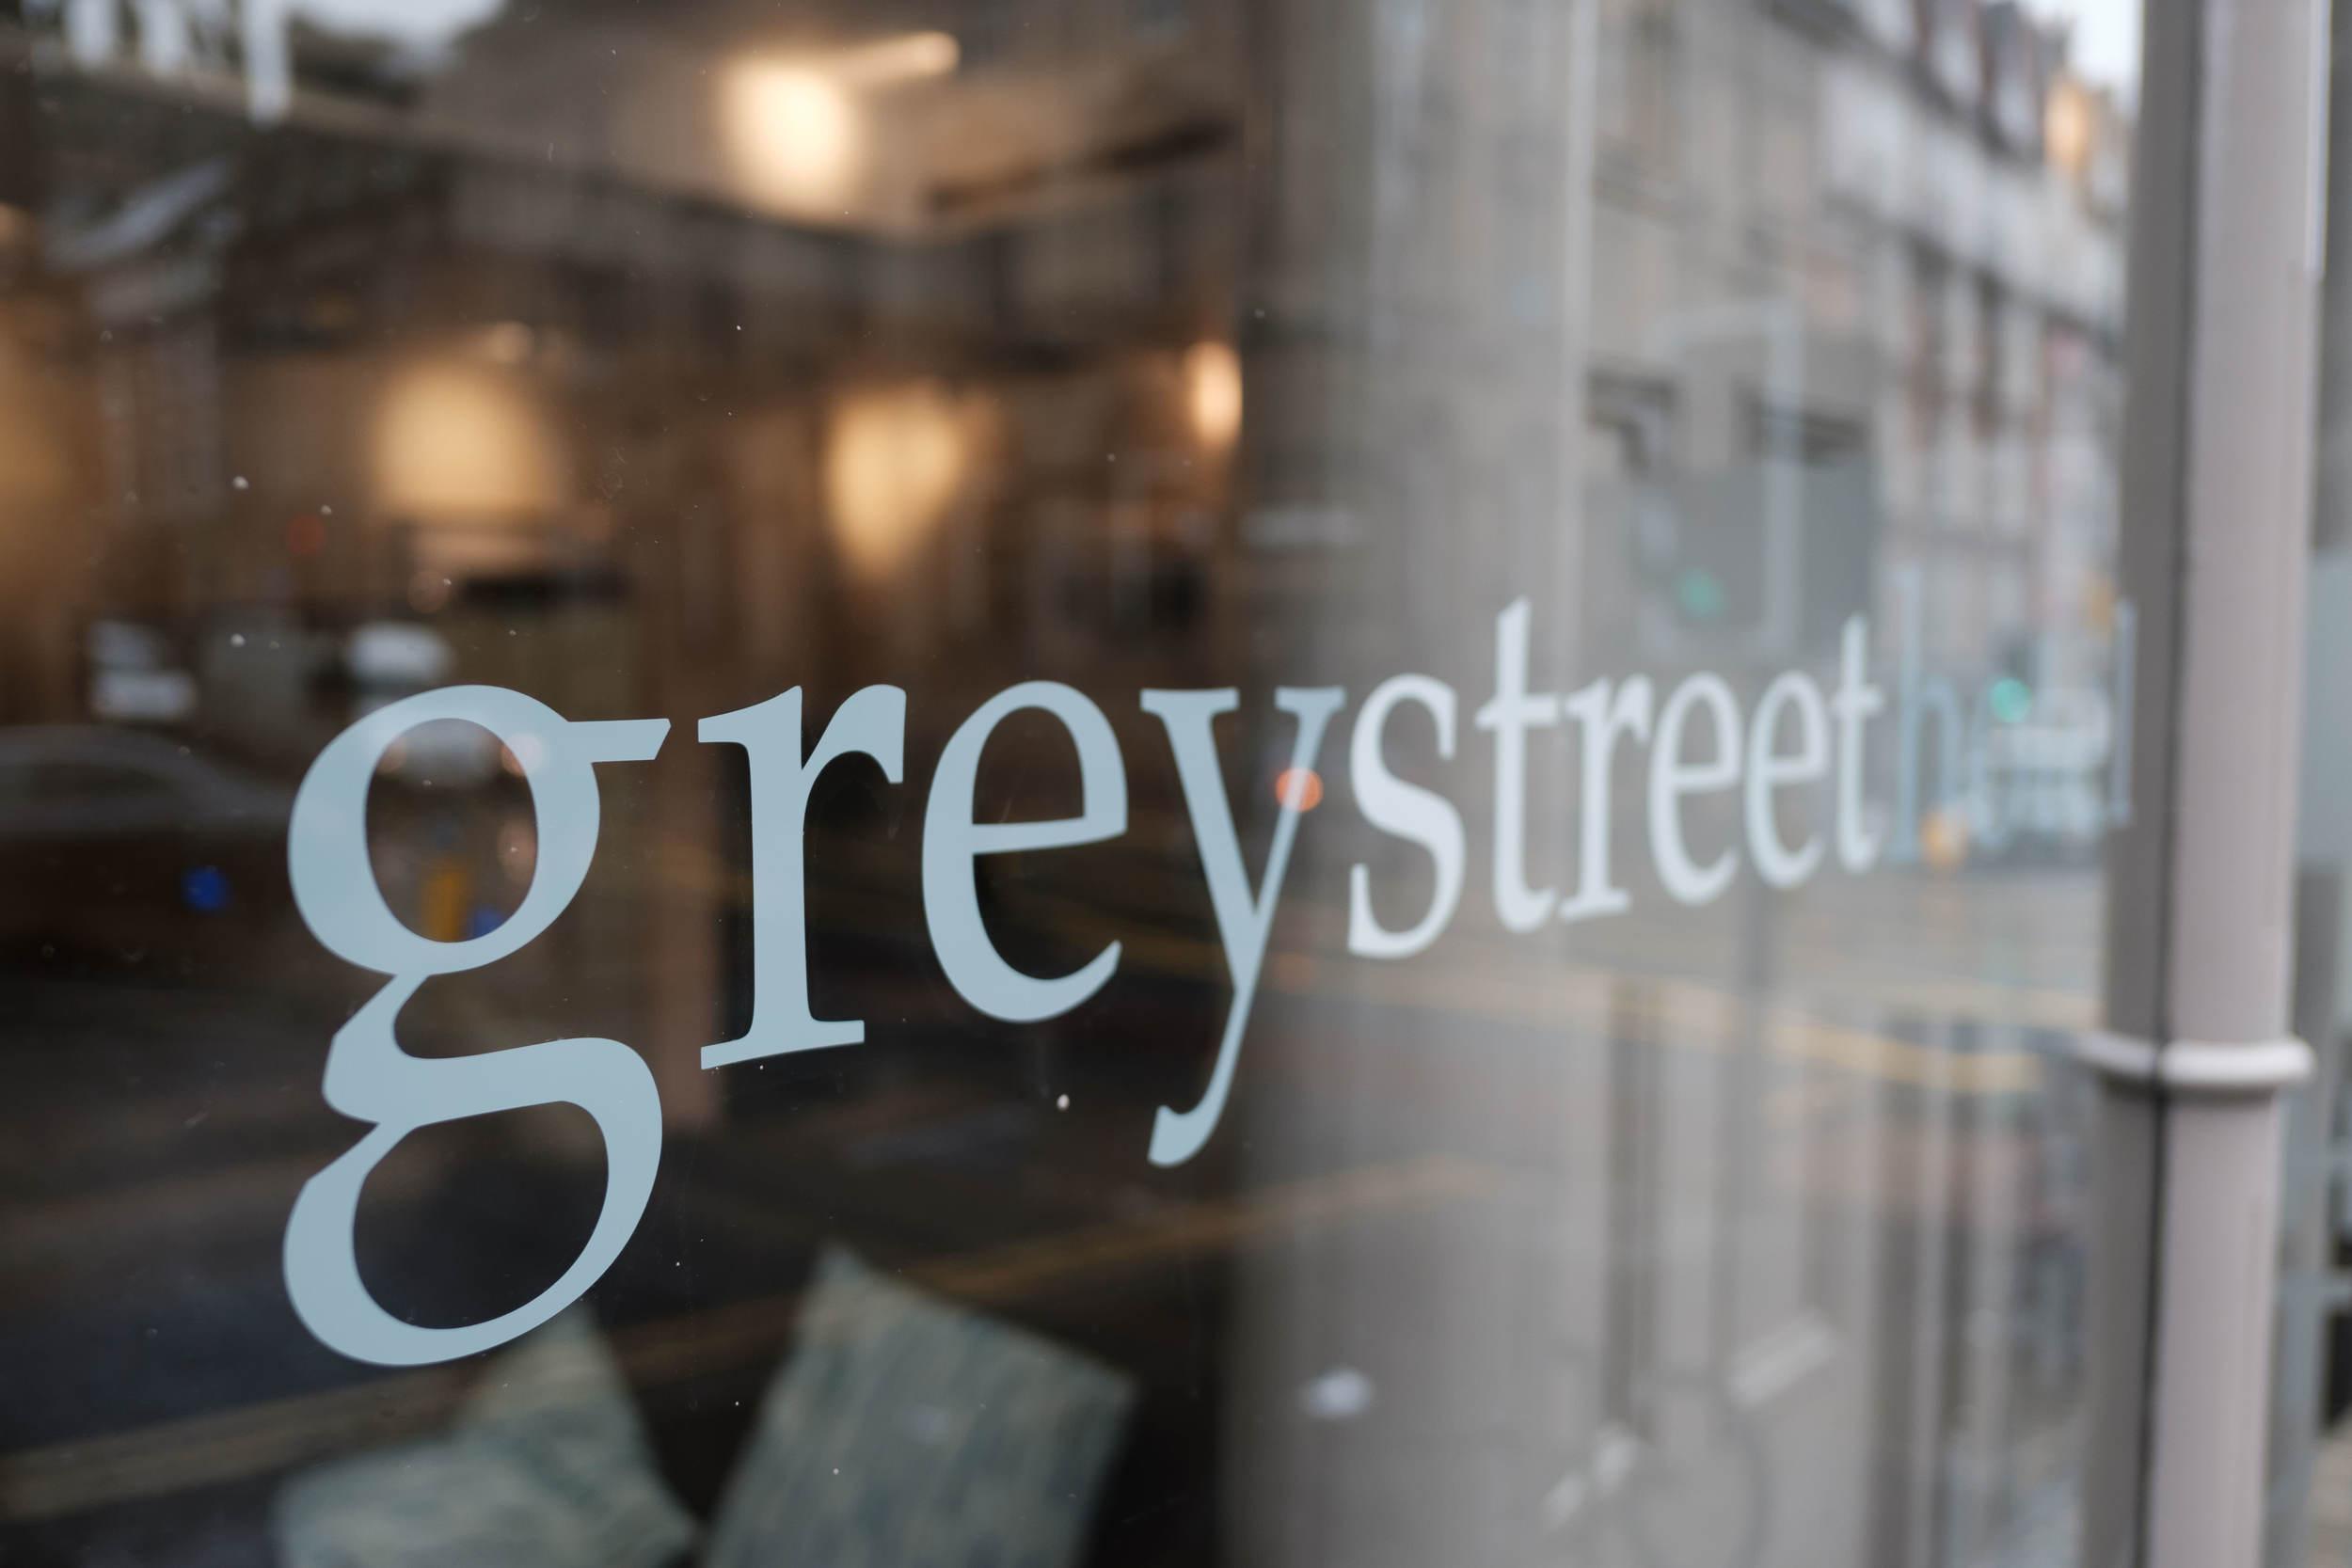 Grey Street Hotel Wedding Venue Sign Newcastle upon Tyne